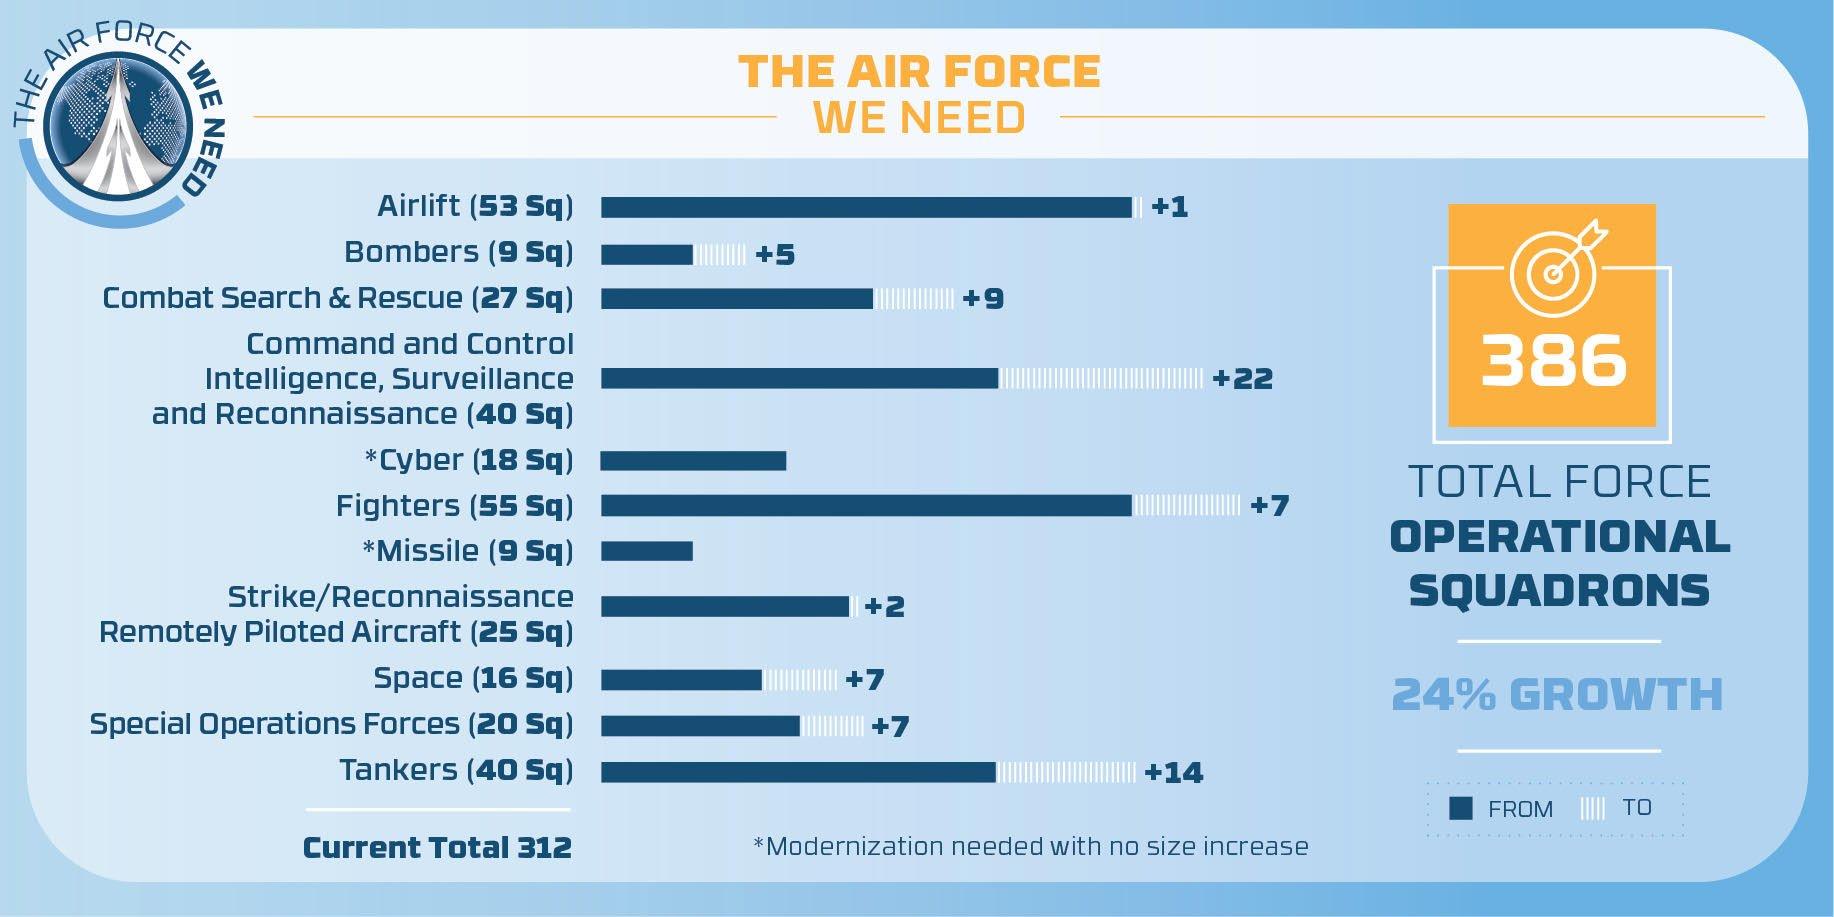 Air Force expansion plan